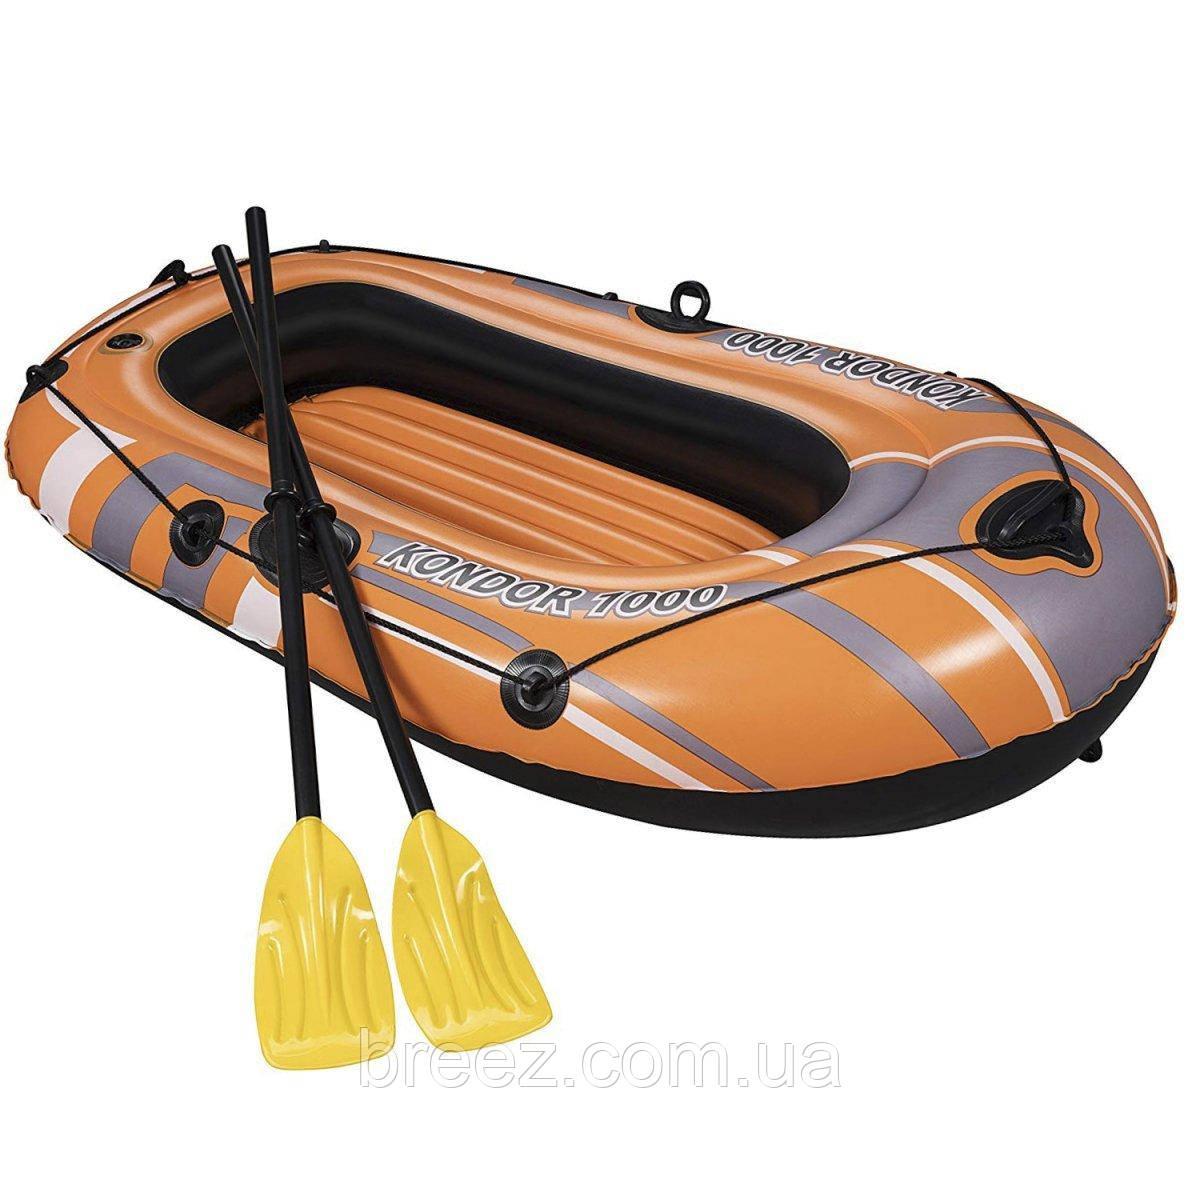 Одноместная надувная лодка Bestway 61078 Hydro-Force Raft Set, 155 х 93 см